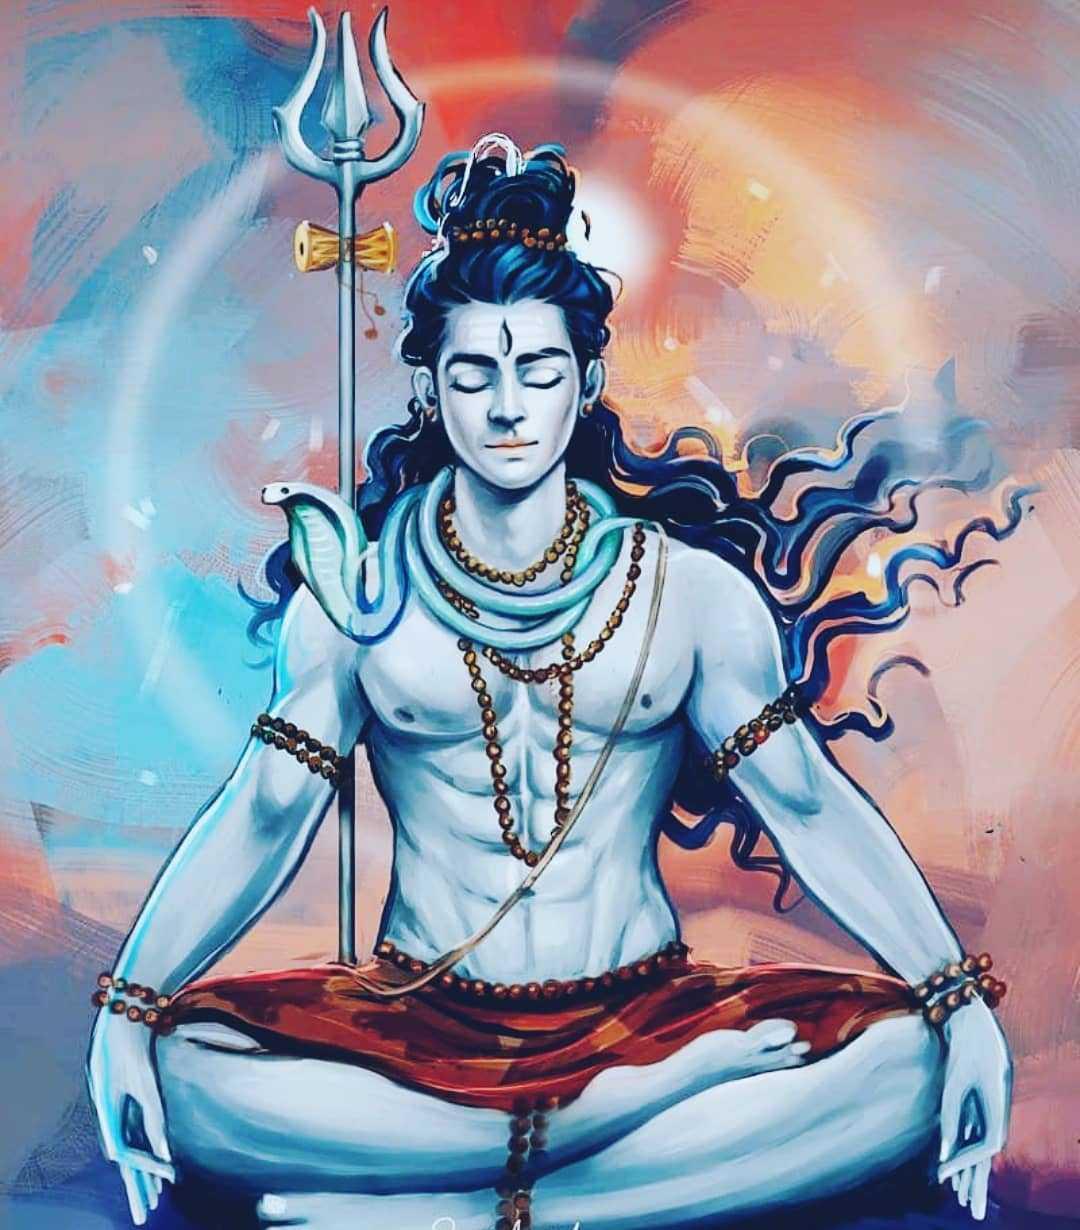 Wallpaper Of Lord Shiva For Mobile - Wallpaper Of Lord Shiva For Mobile